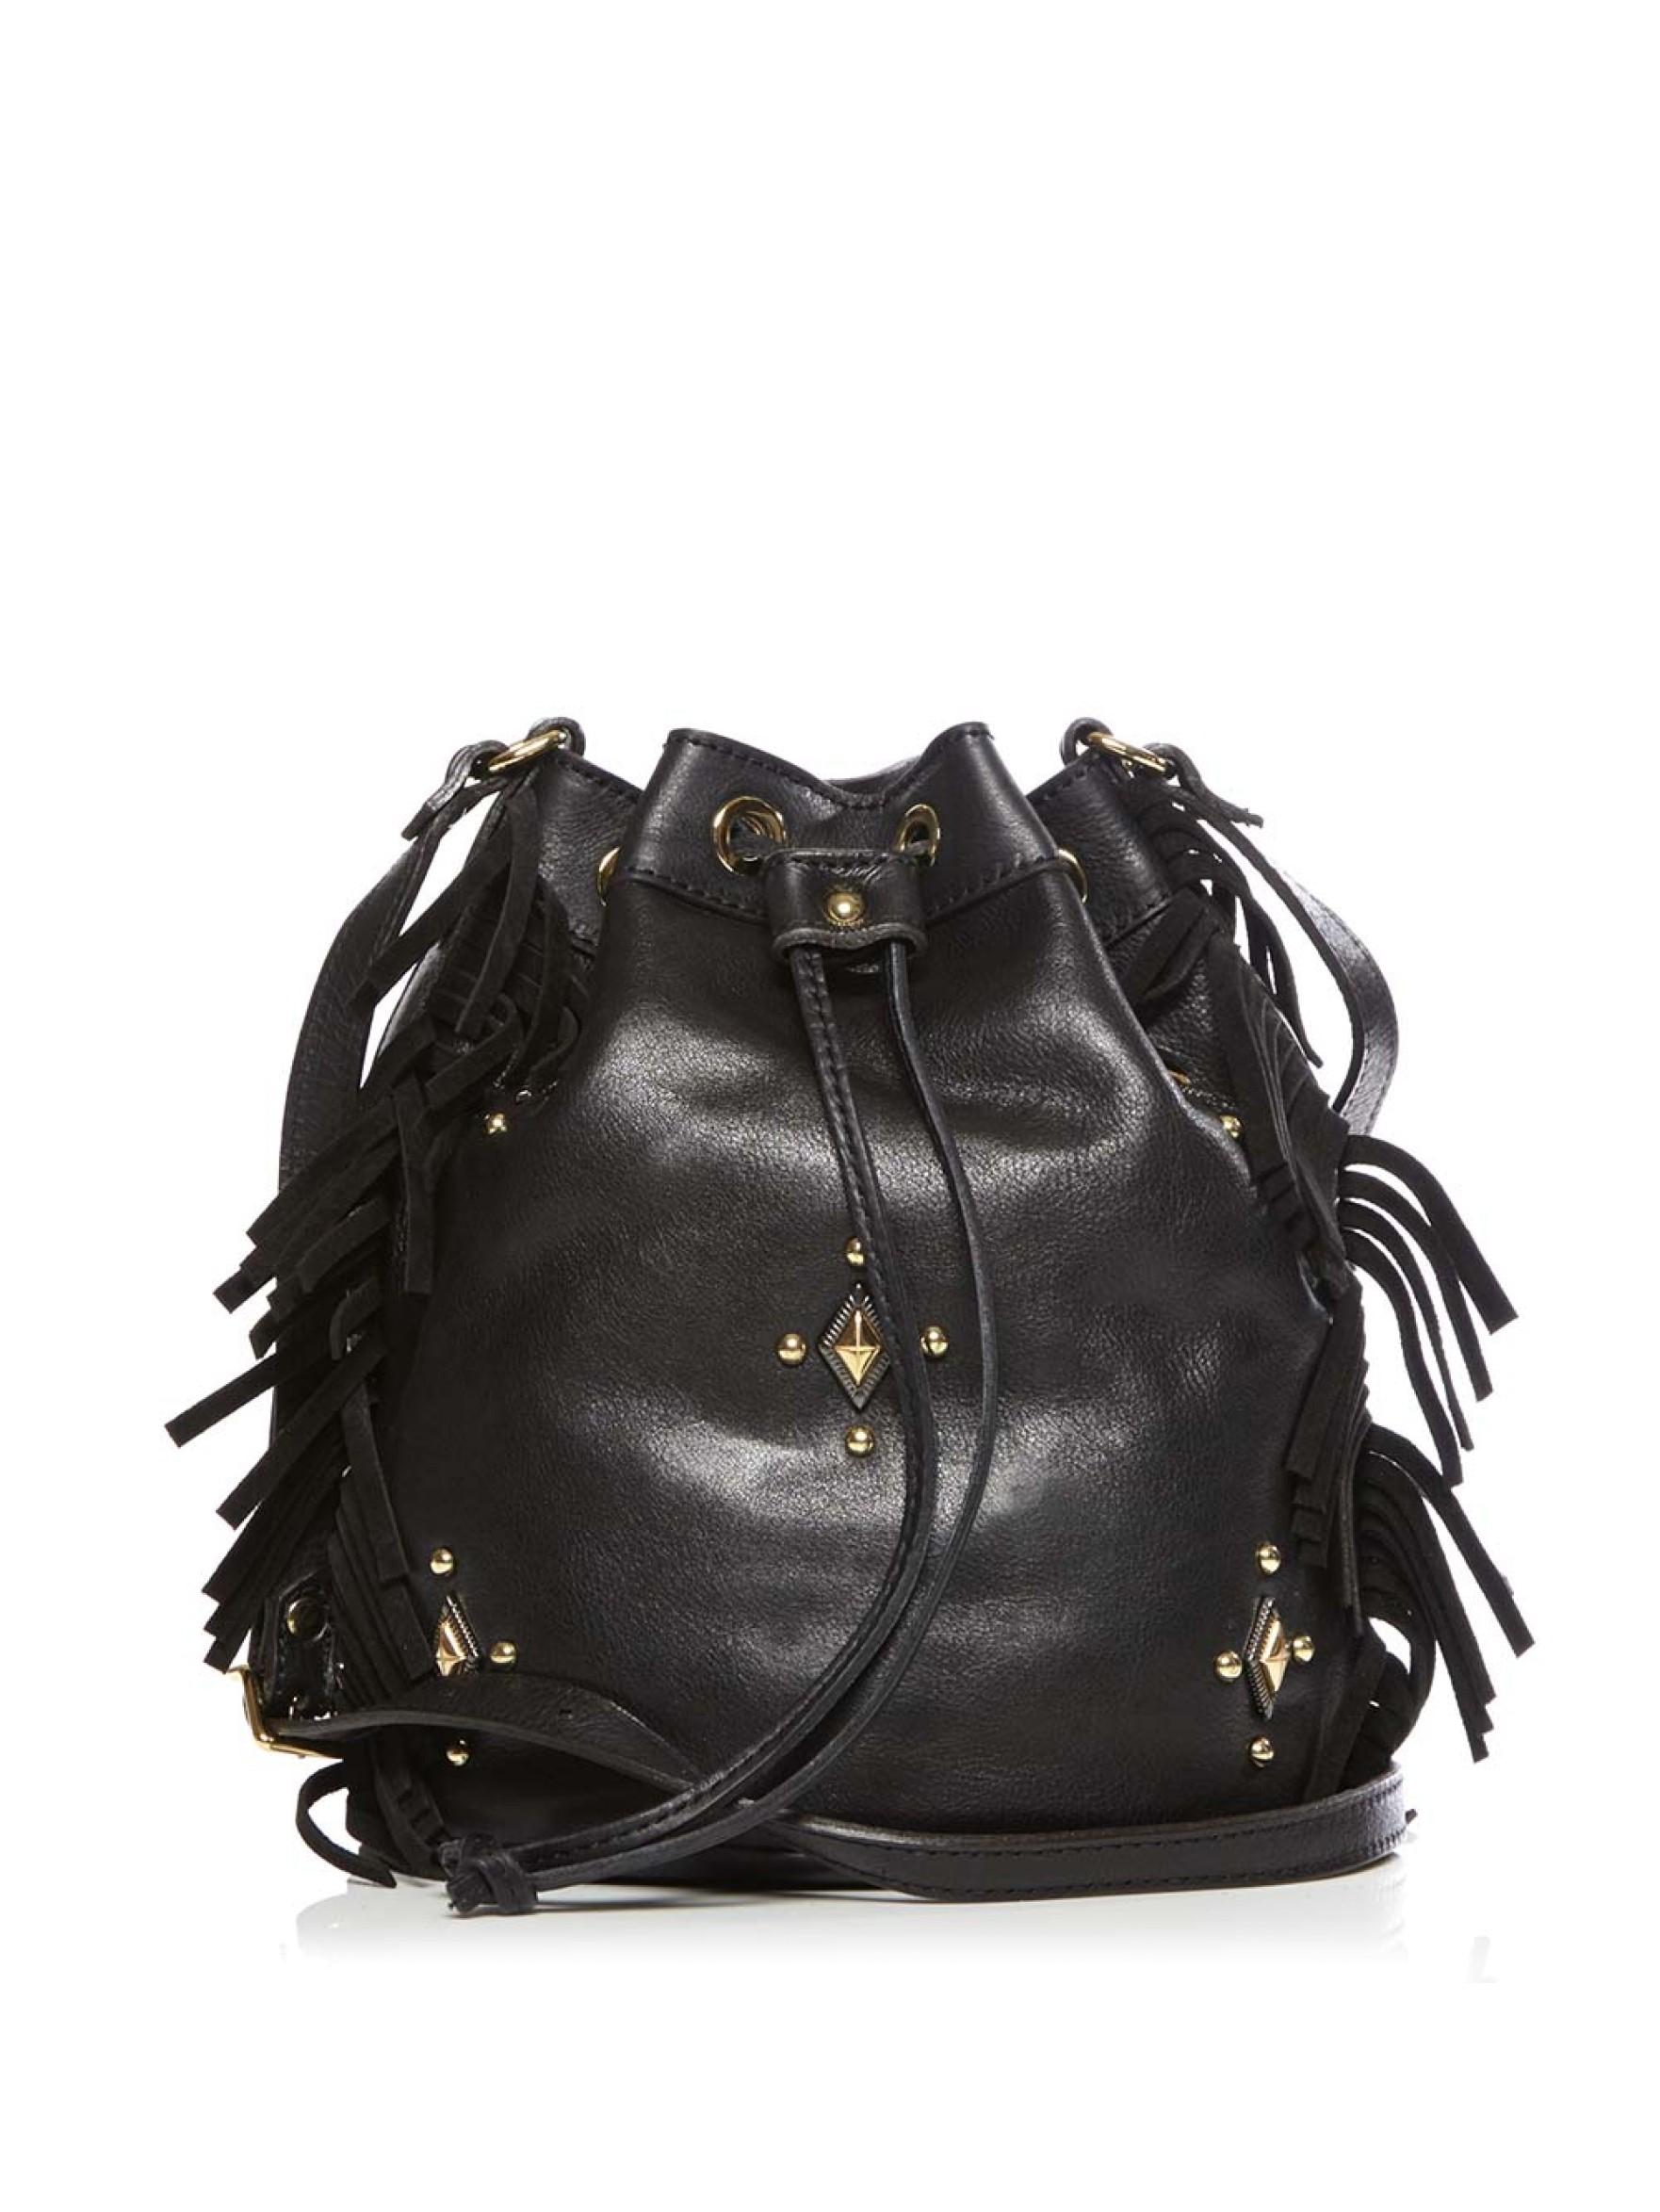 authentic ysl bags sale - emmanuel small studded fringe bucket bag, black